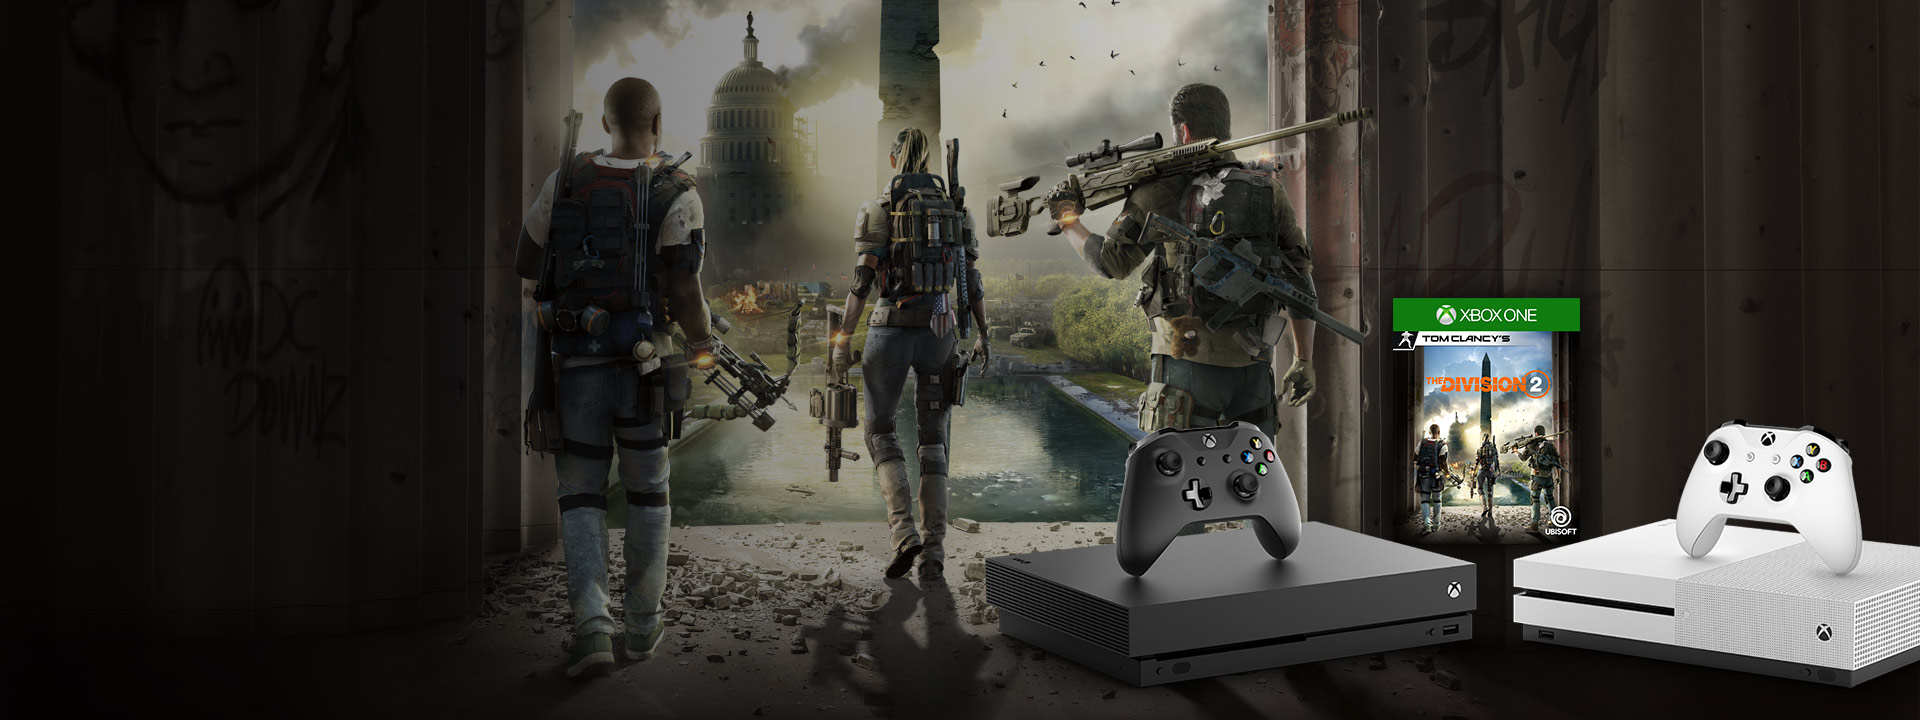 Xbox One Consoles & Bundles | Xbox